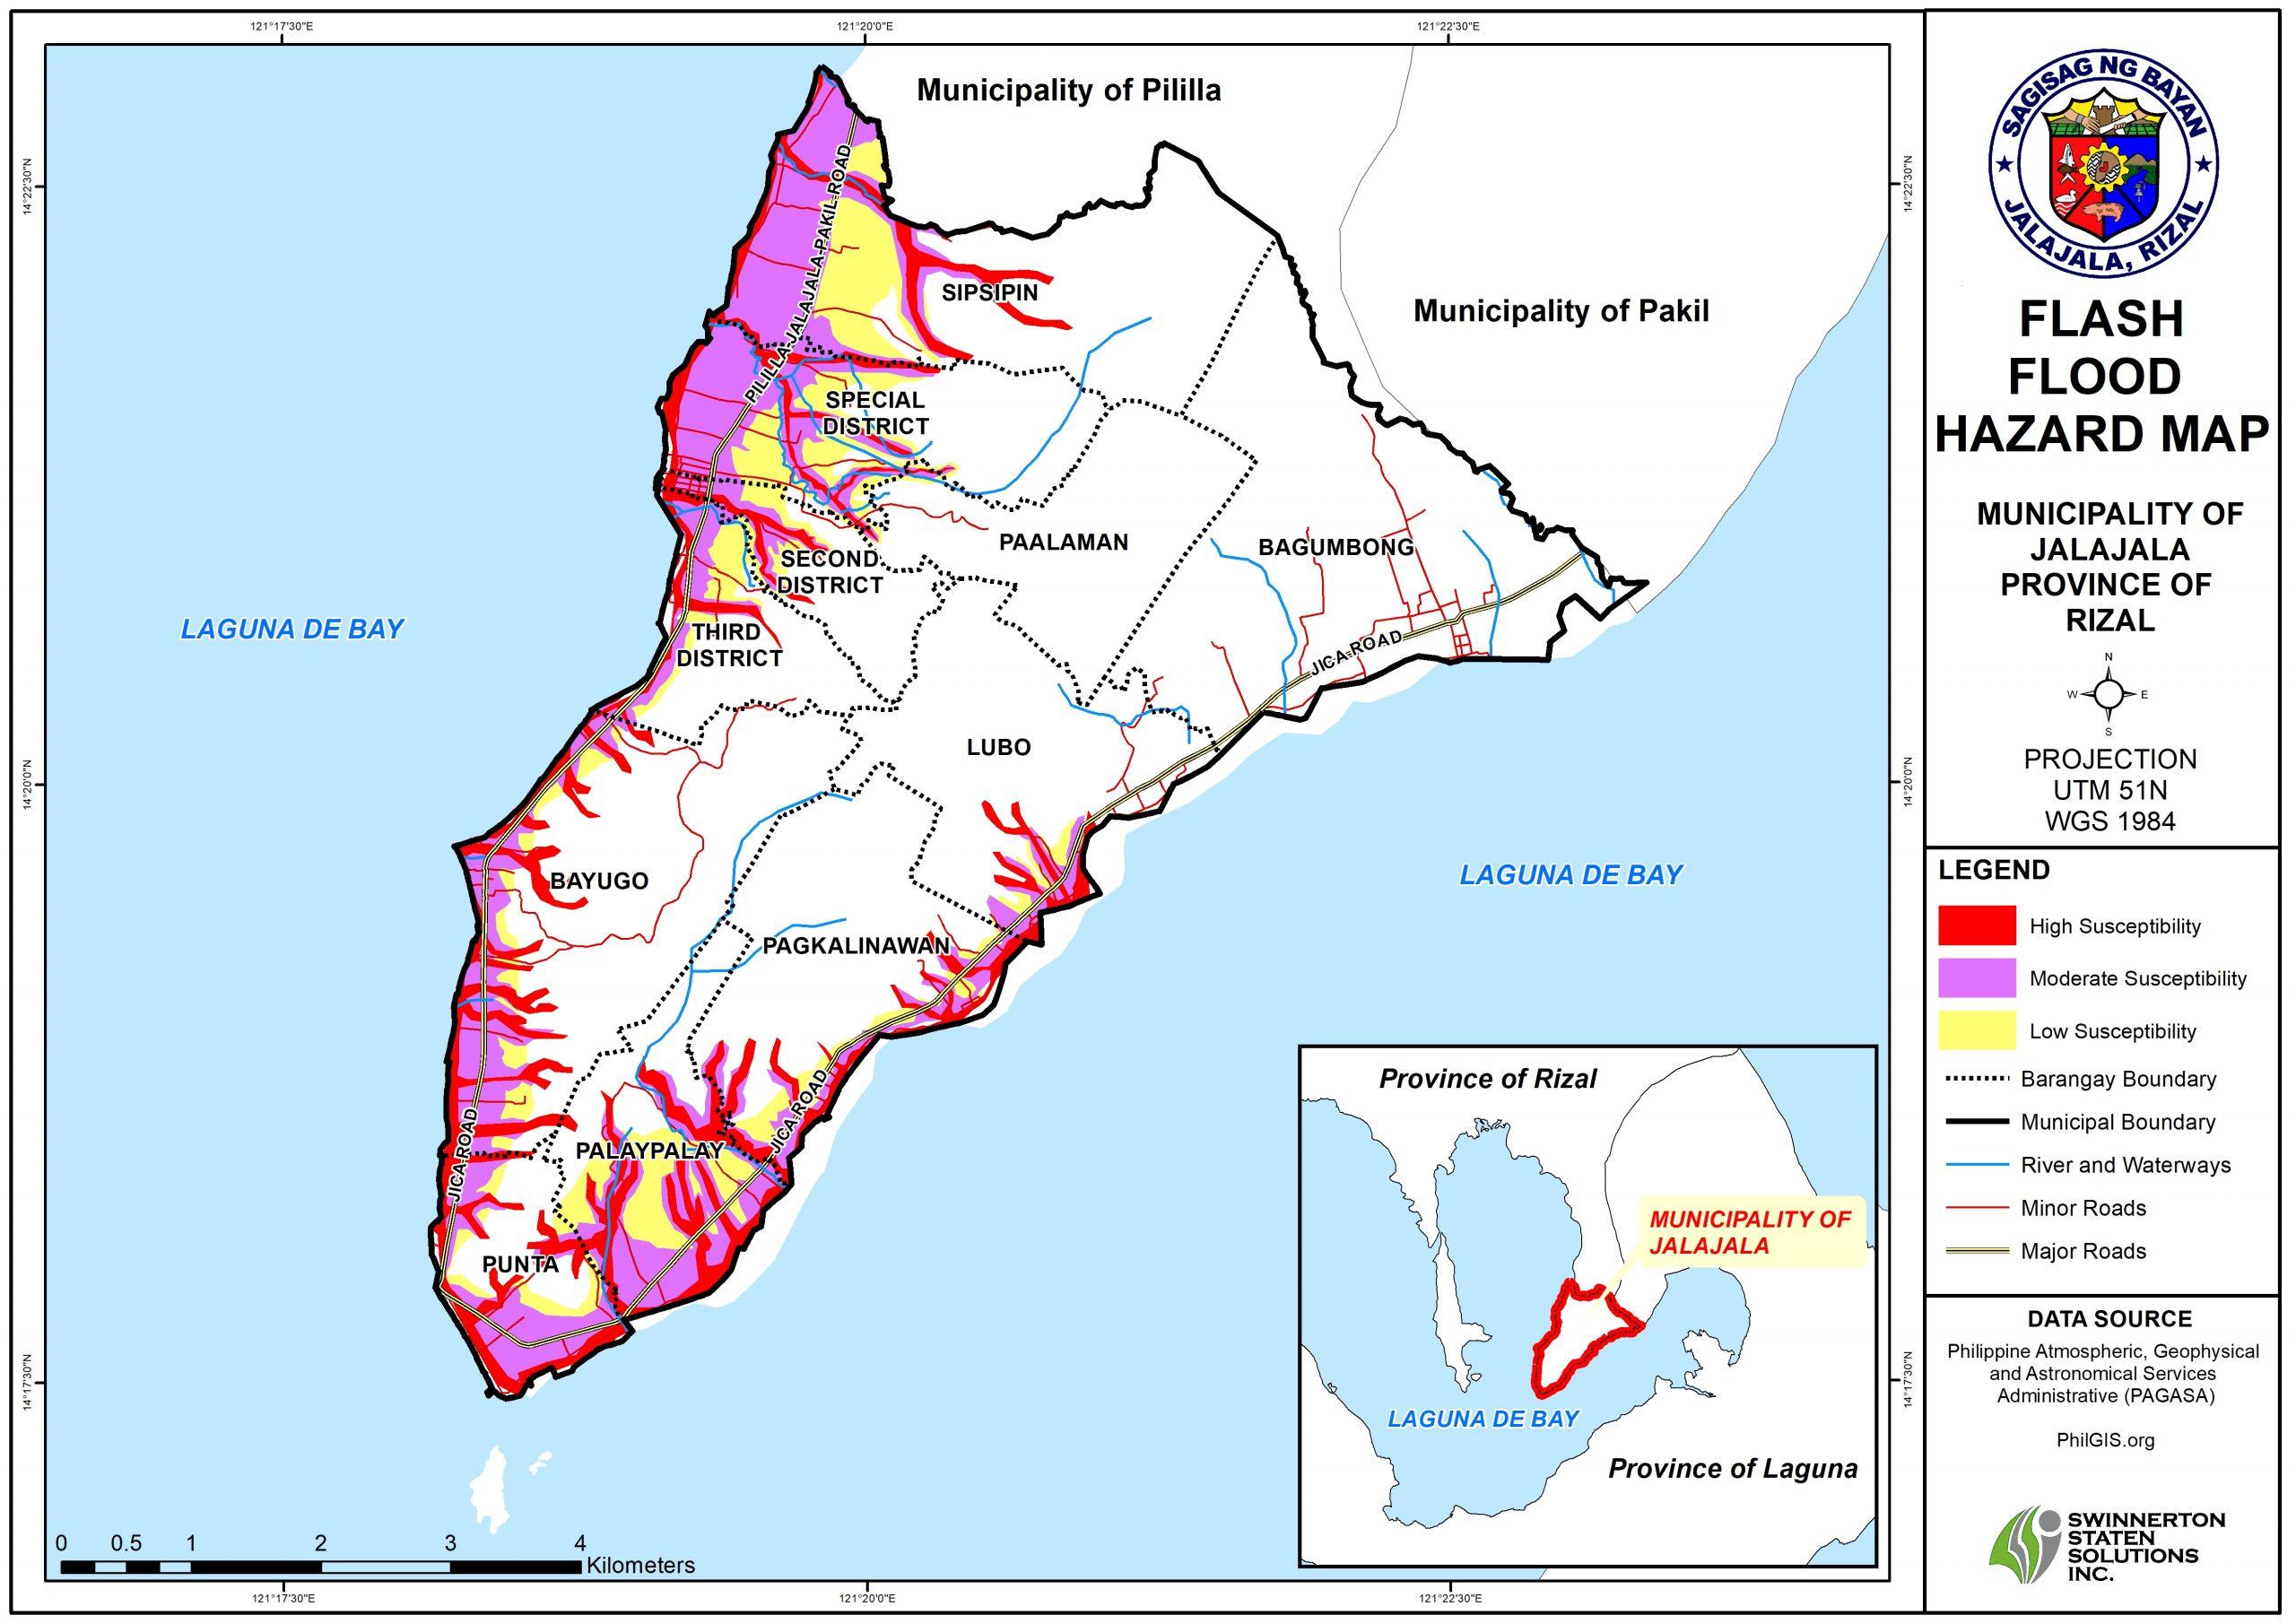 FLASH FLOOD HAZARD MAP